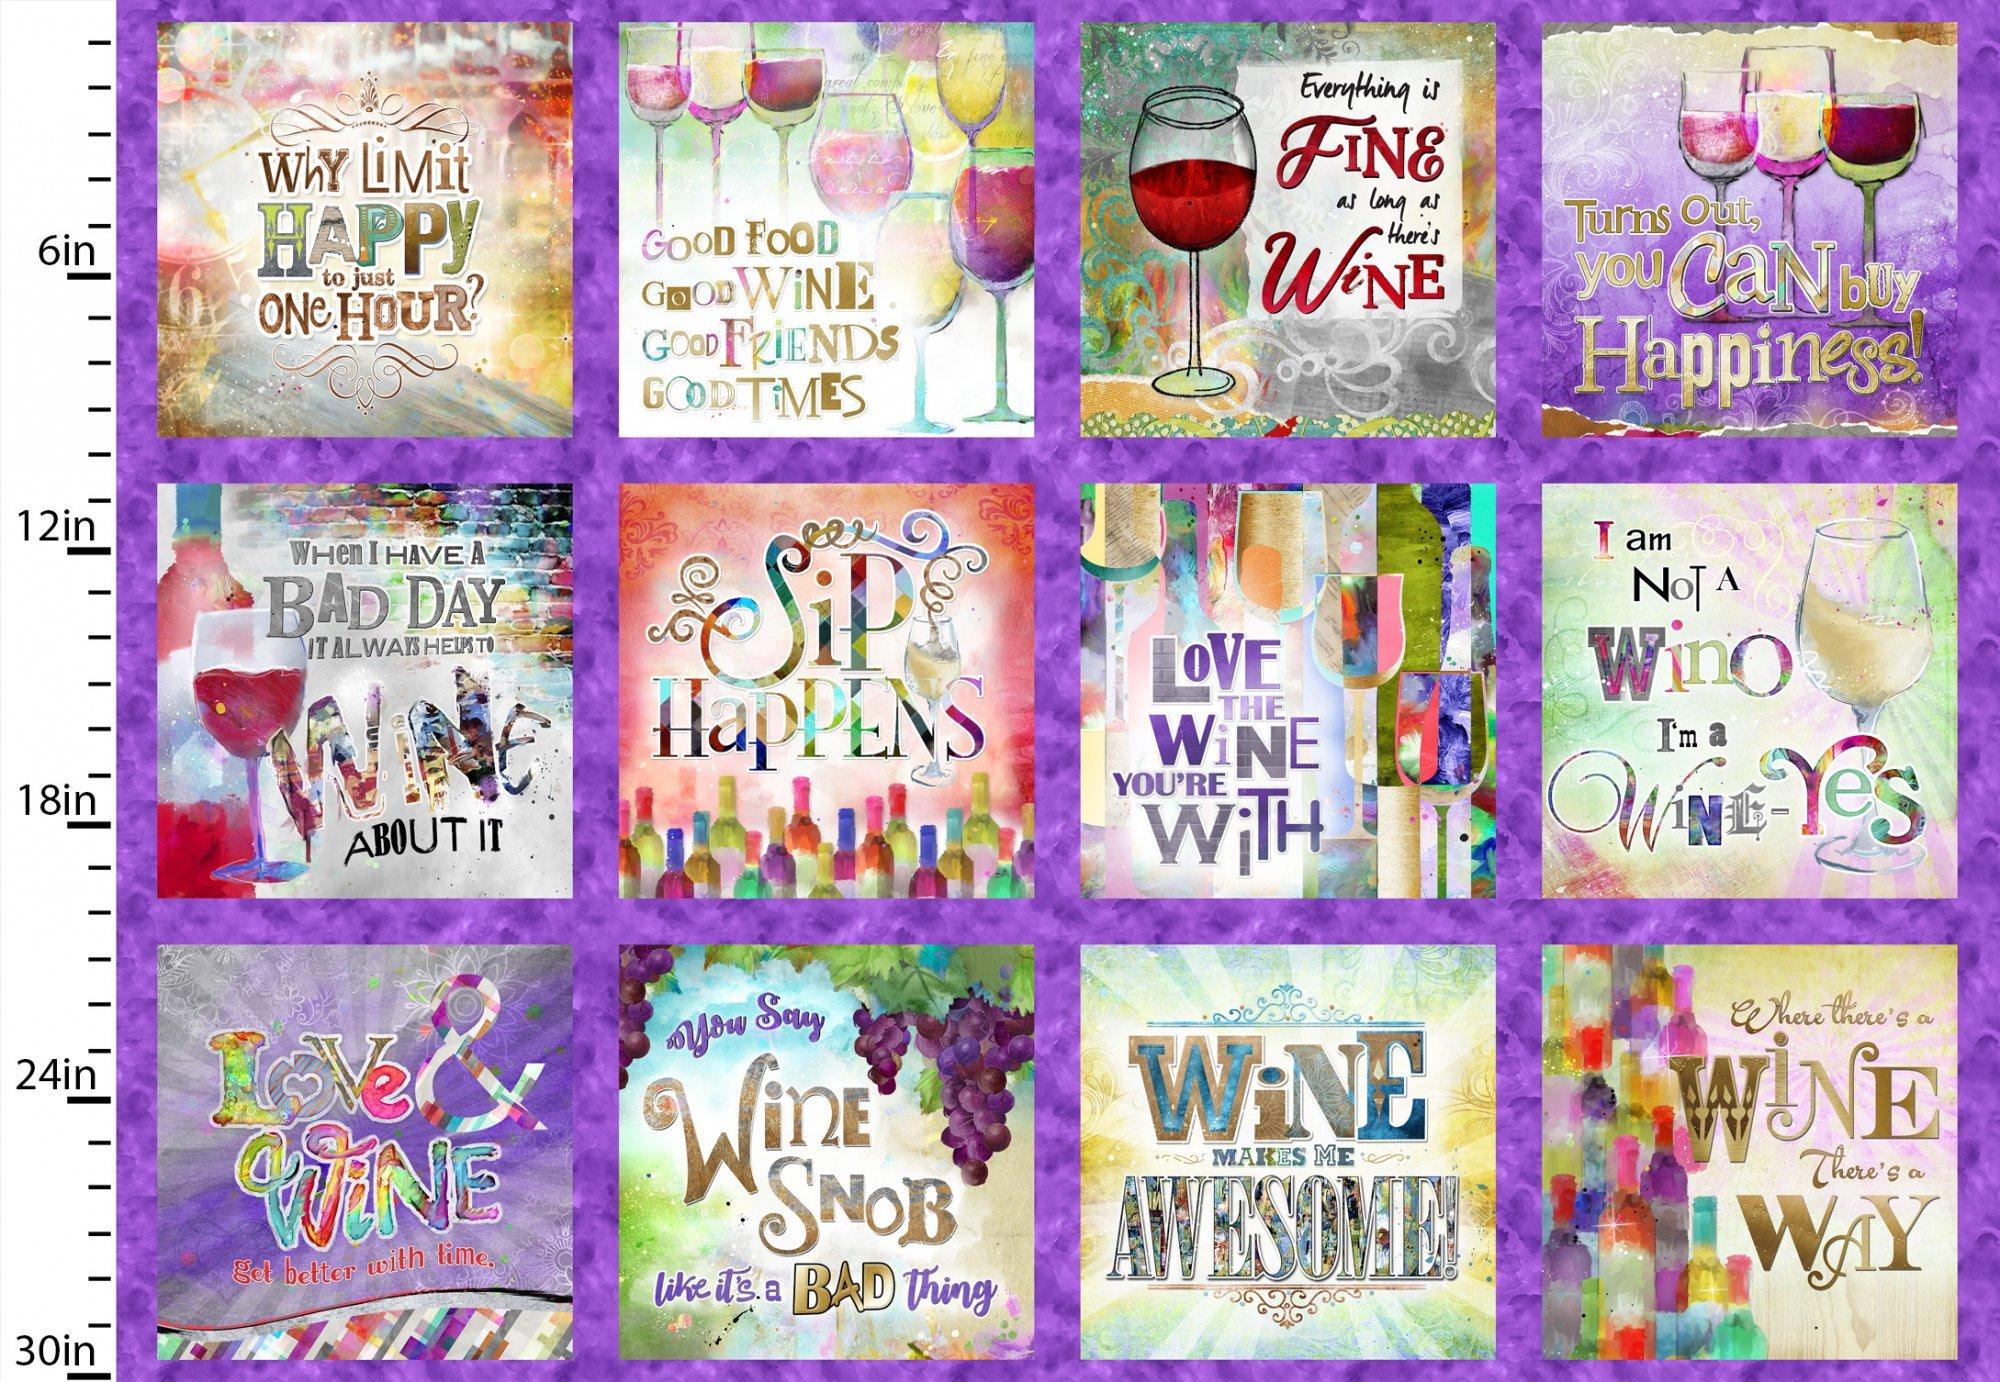 Sip & Snip Wine 14903 30 Panel